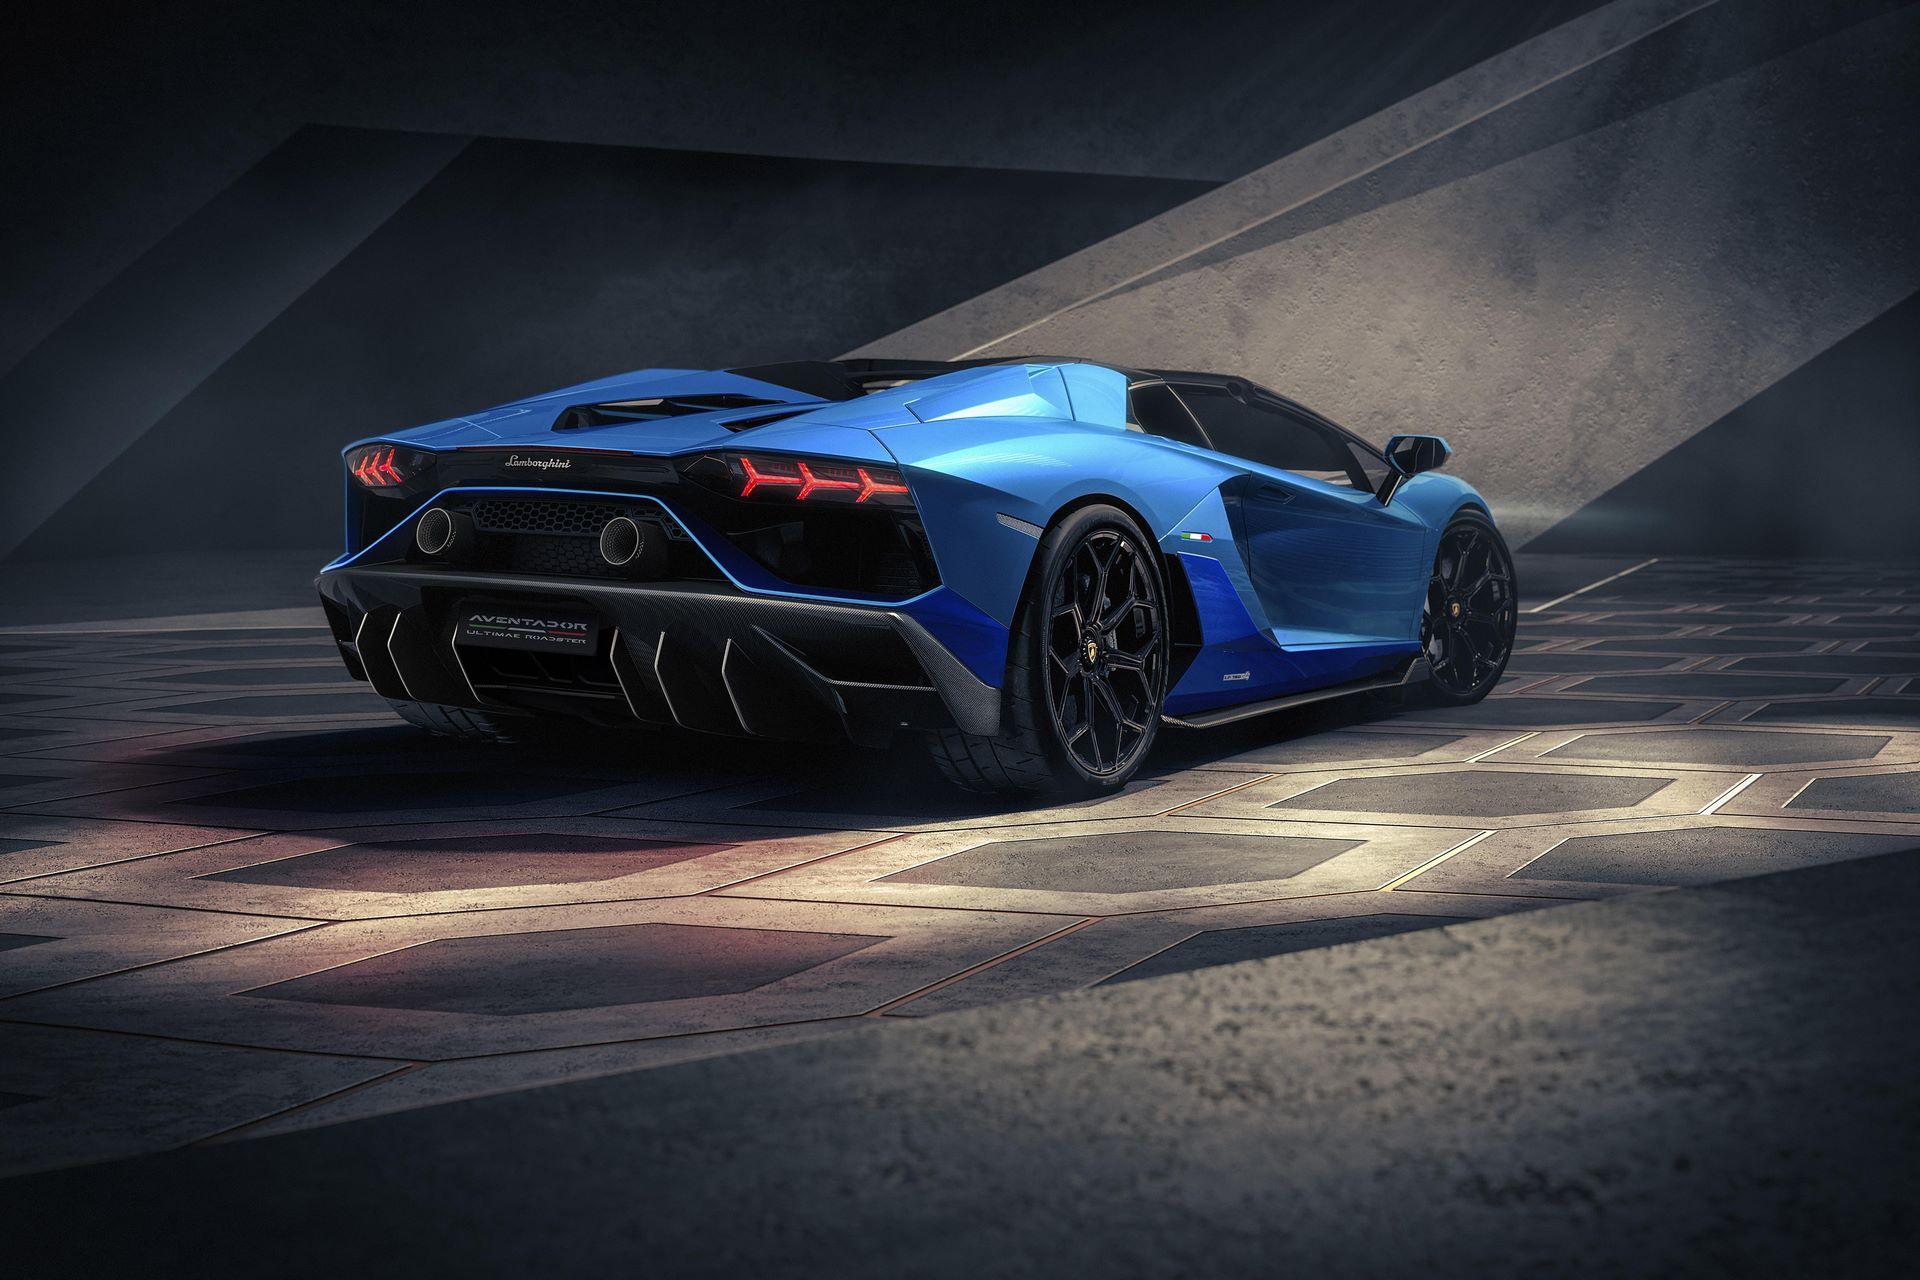 Lamborghini-Aventador-LP780-4-Ultimae-25